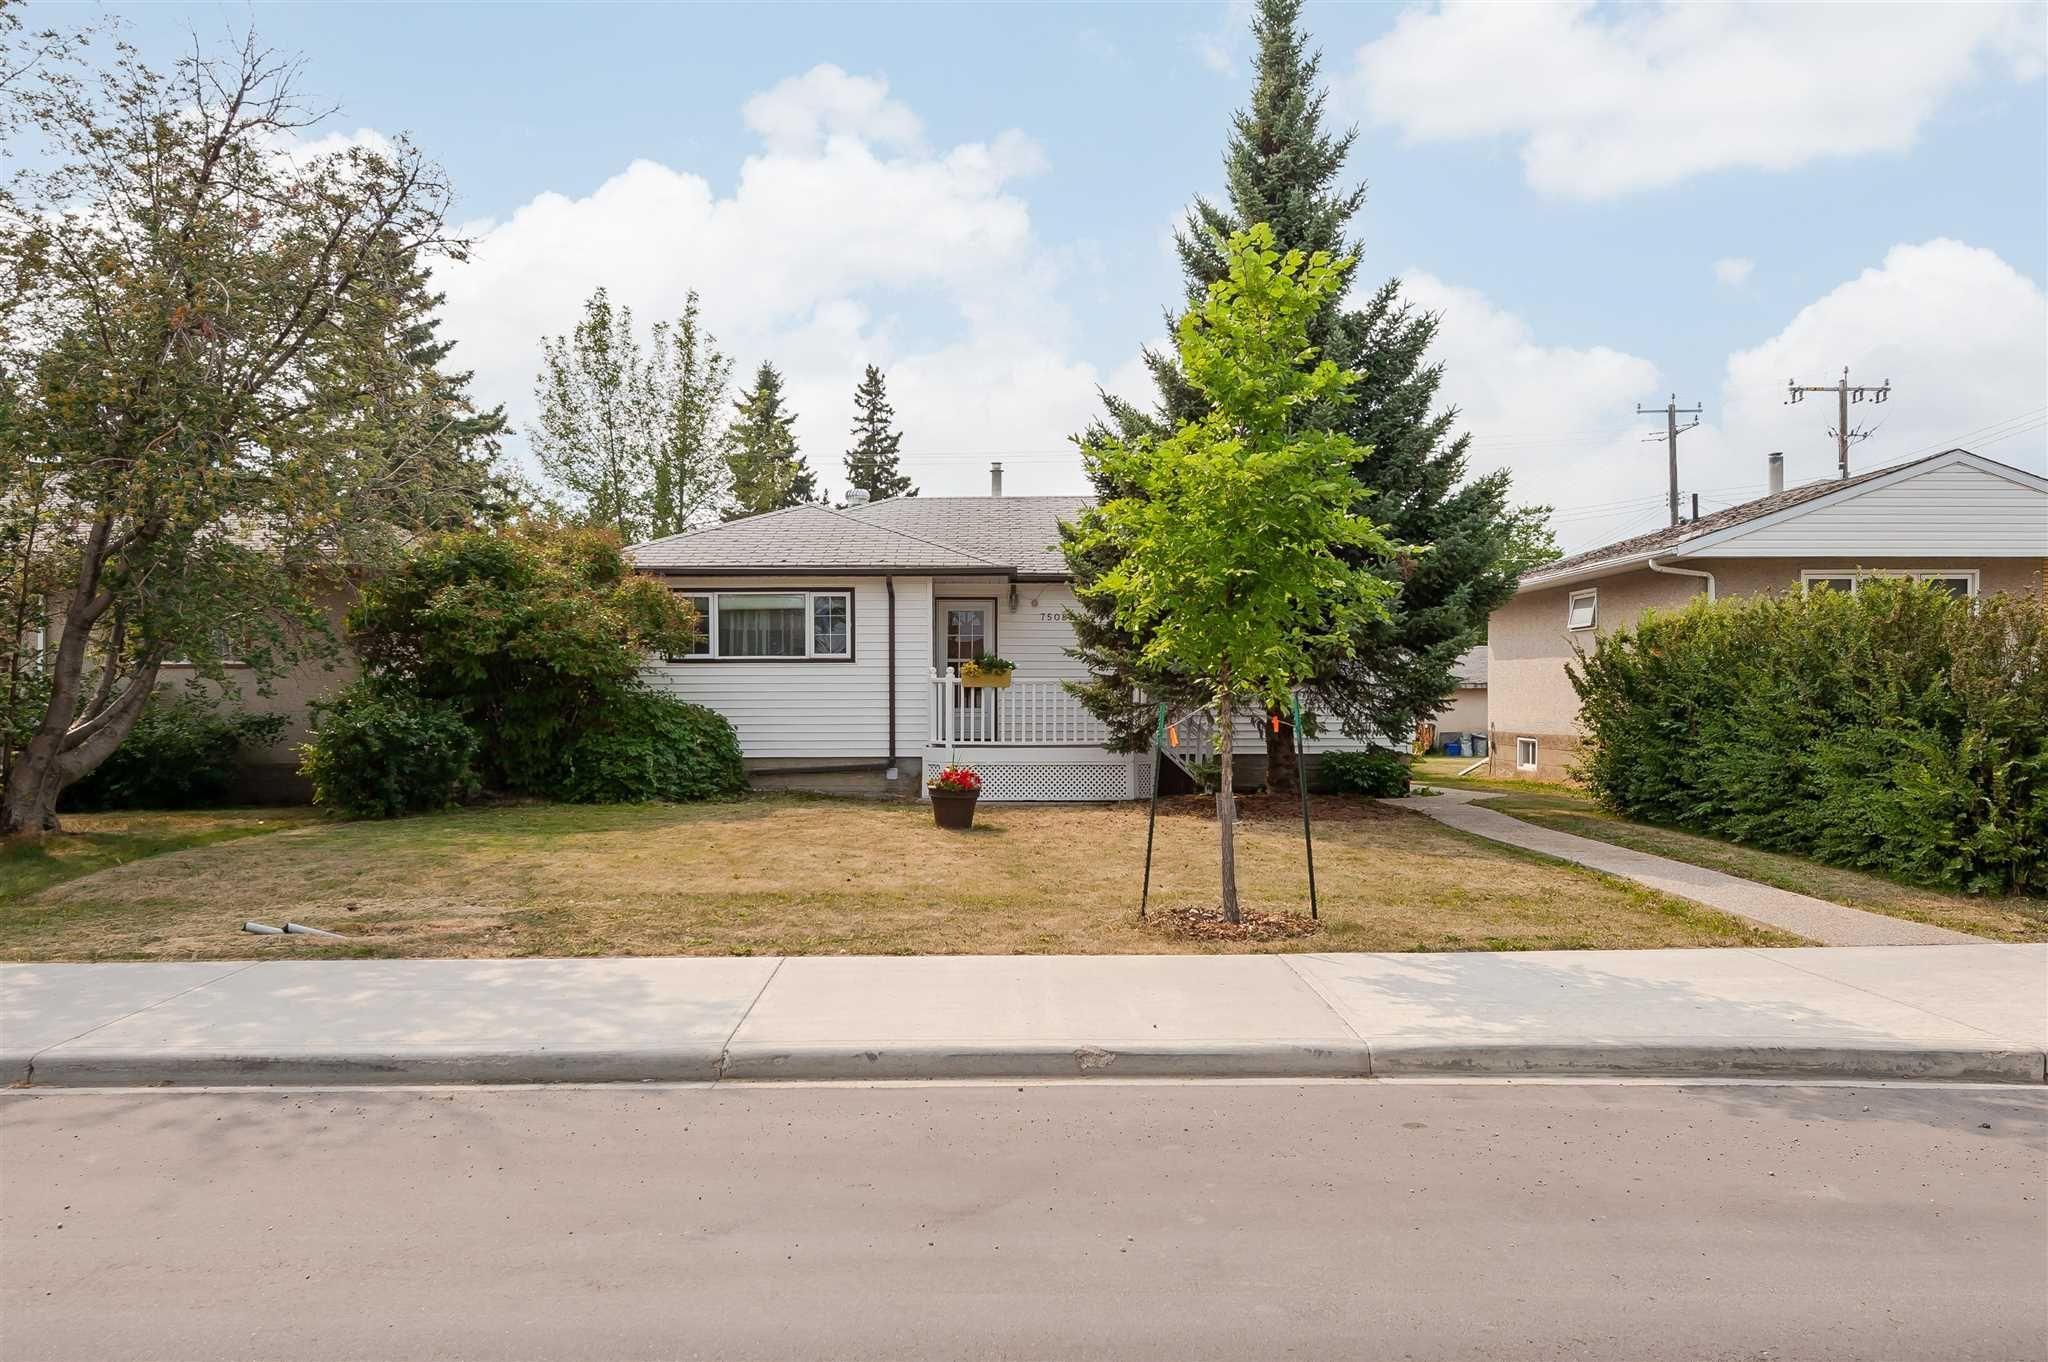 Main Photo: 7508 83 Street in Edmonton: Zone 17 House for sale : MLS®# E4258266